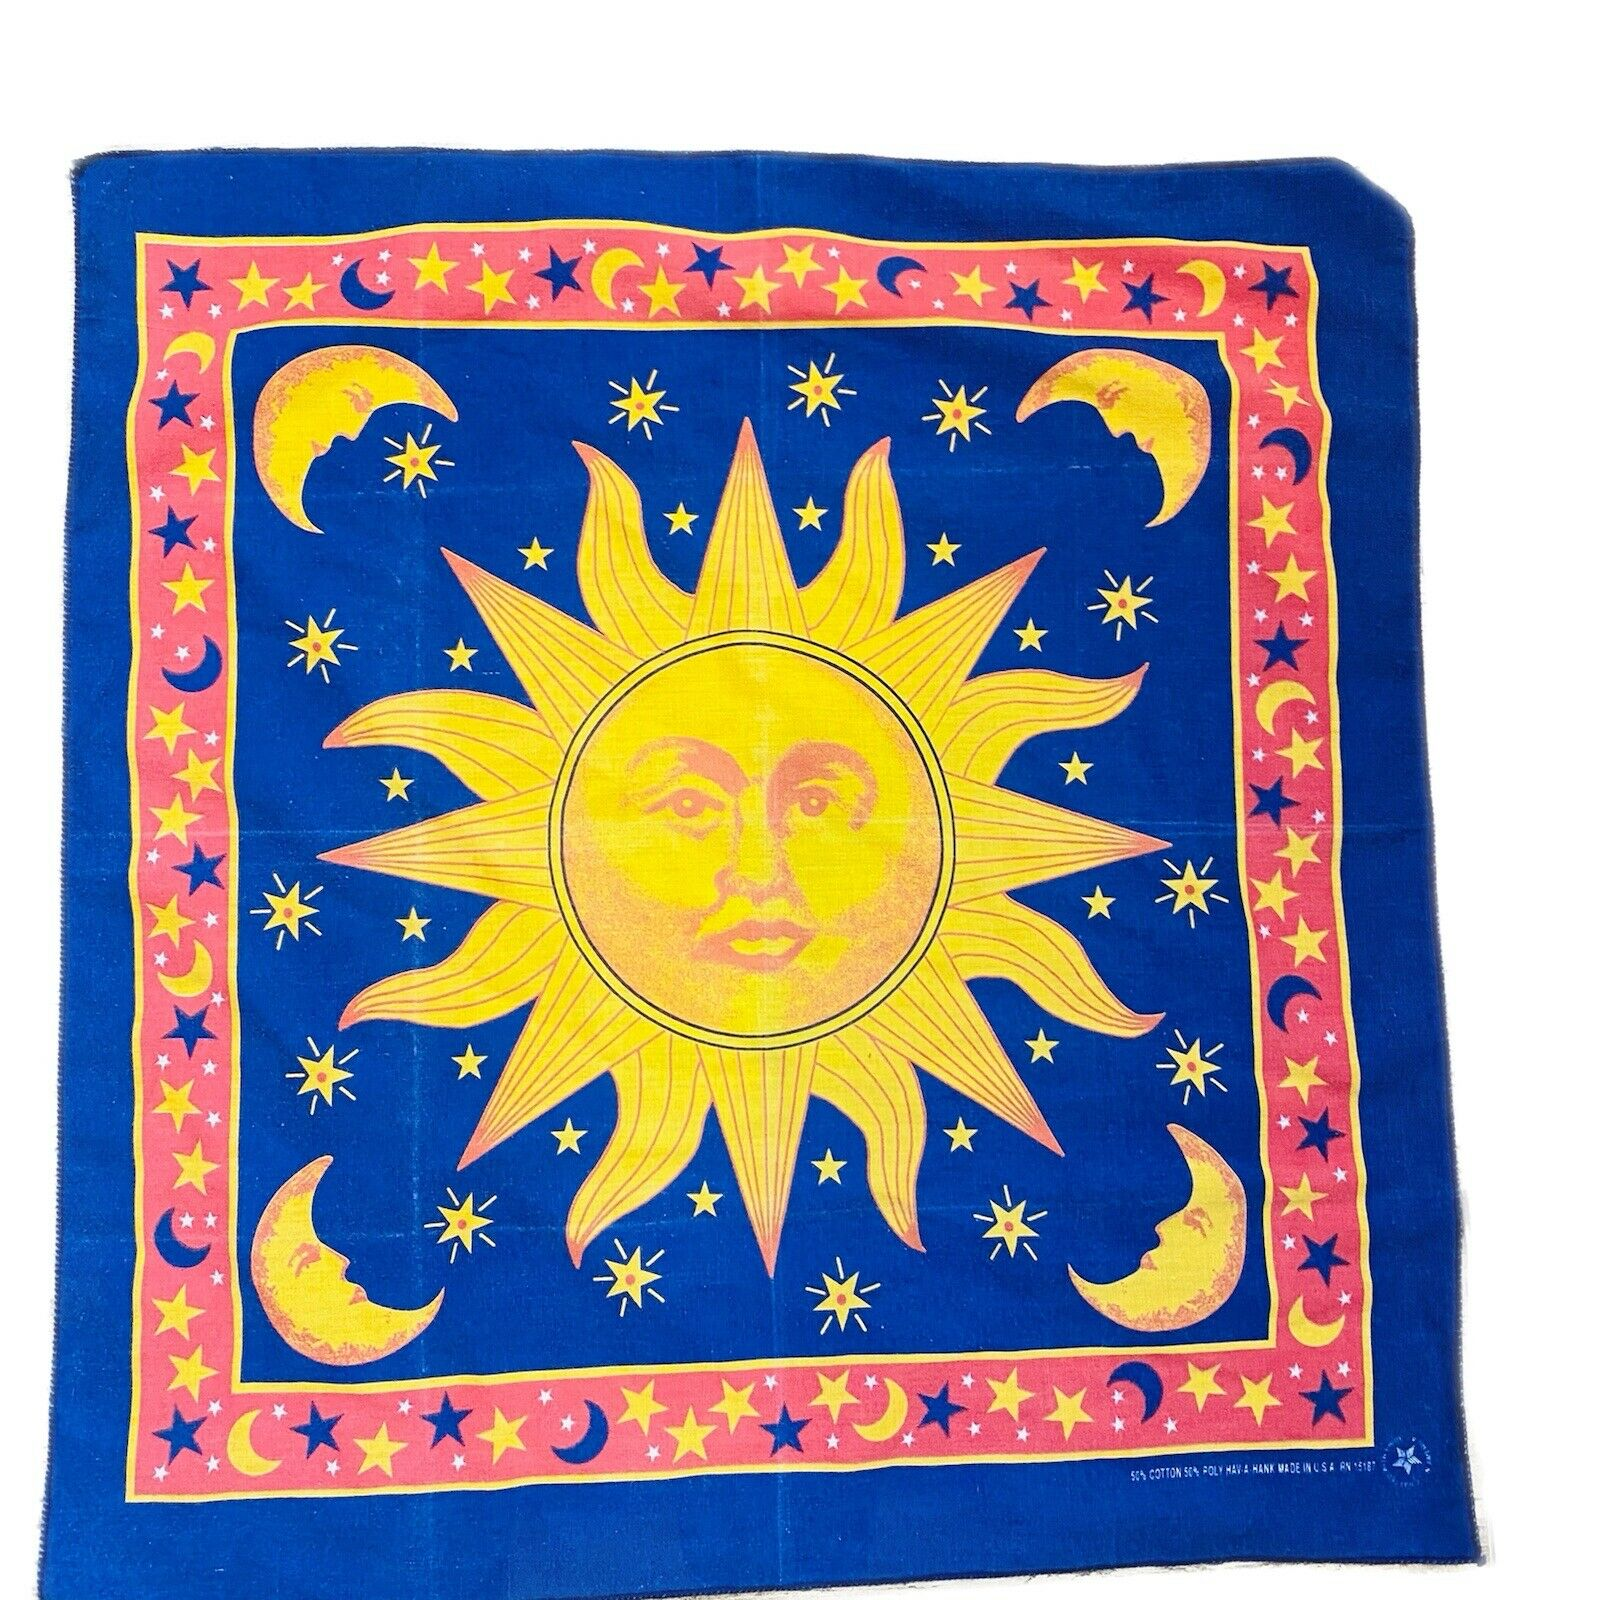 Vintage Sun Celestial Hanky 20x20 Hav A Hank Bandana Face Covering Handkerchief